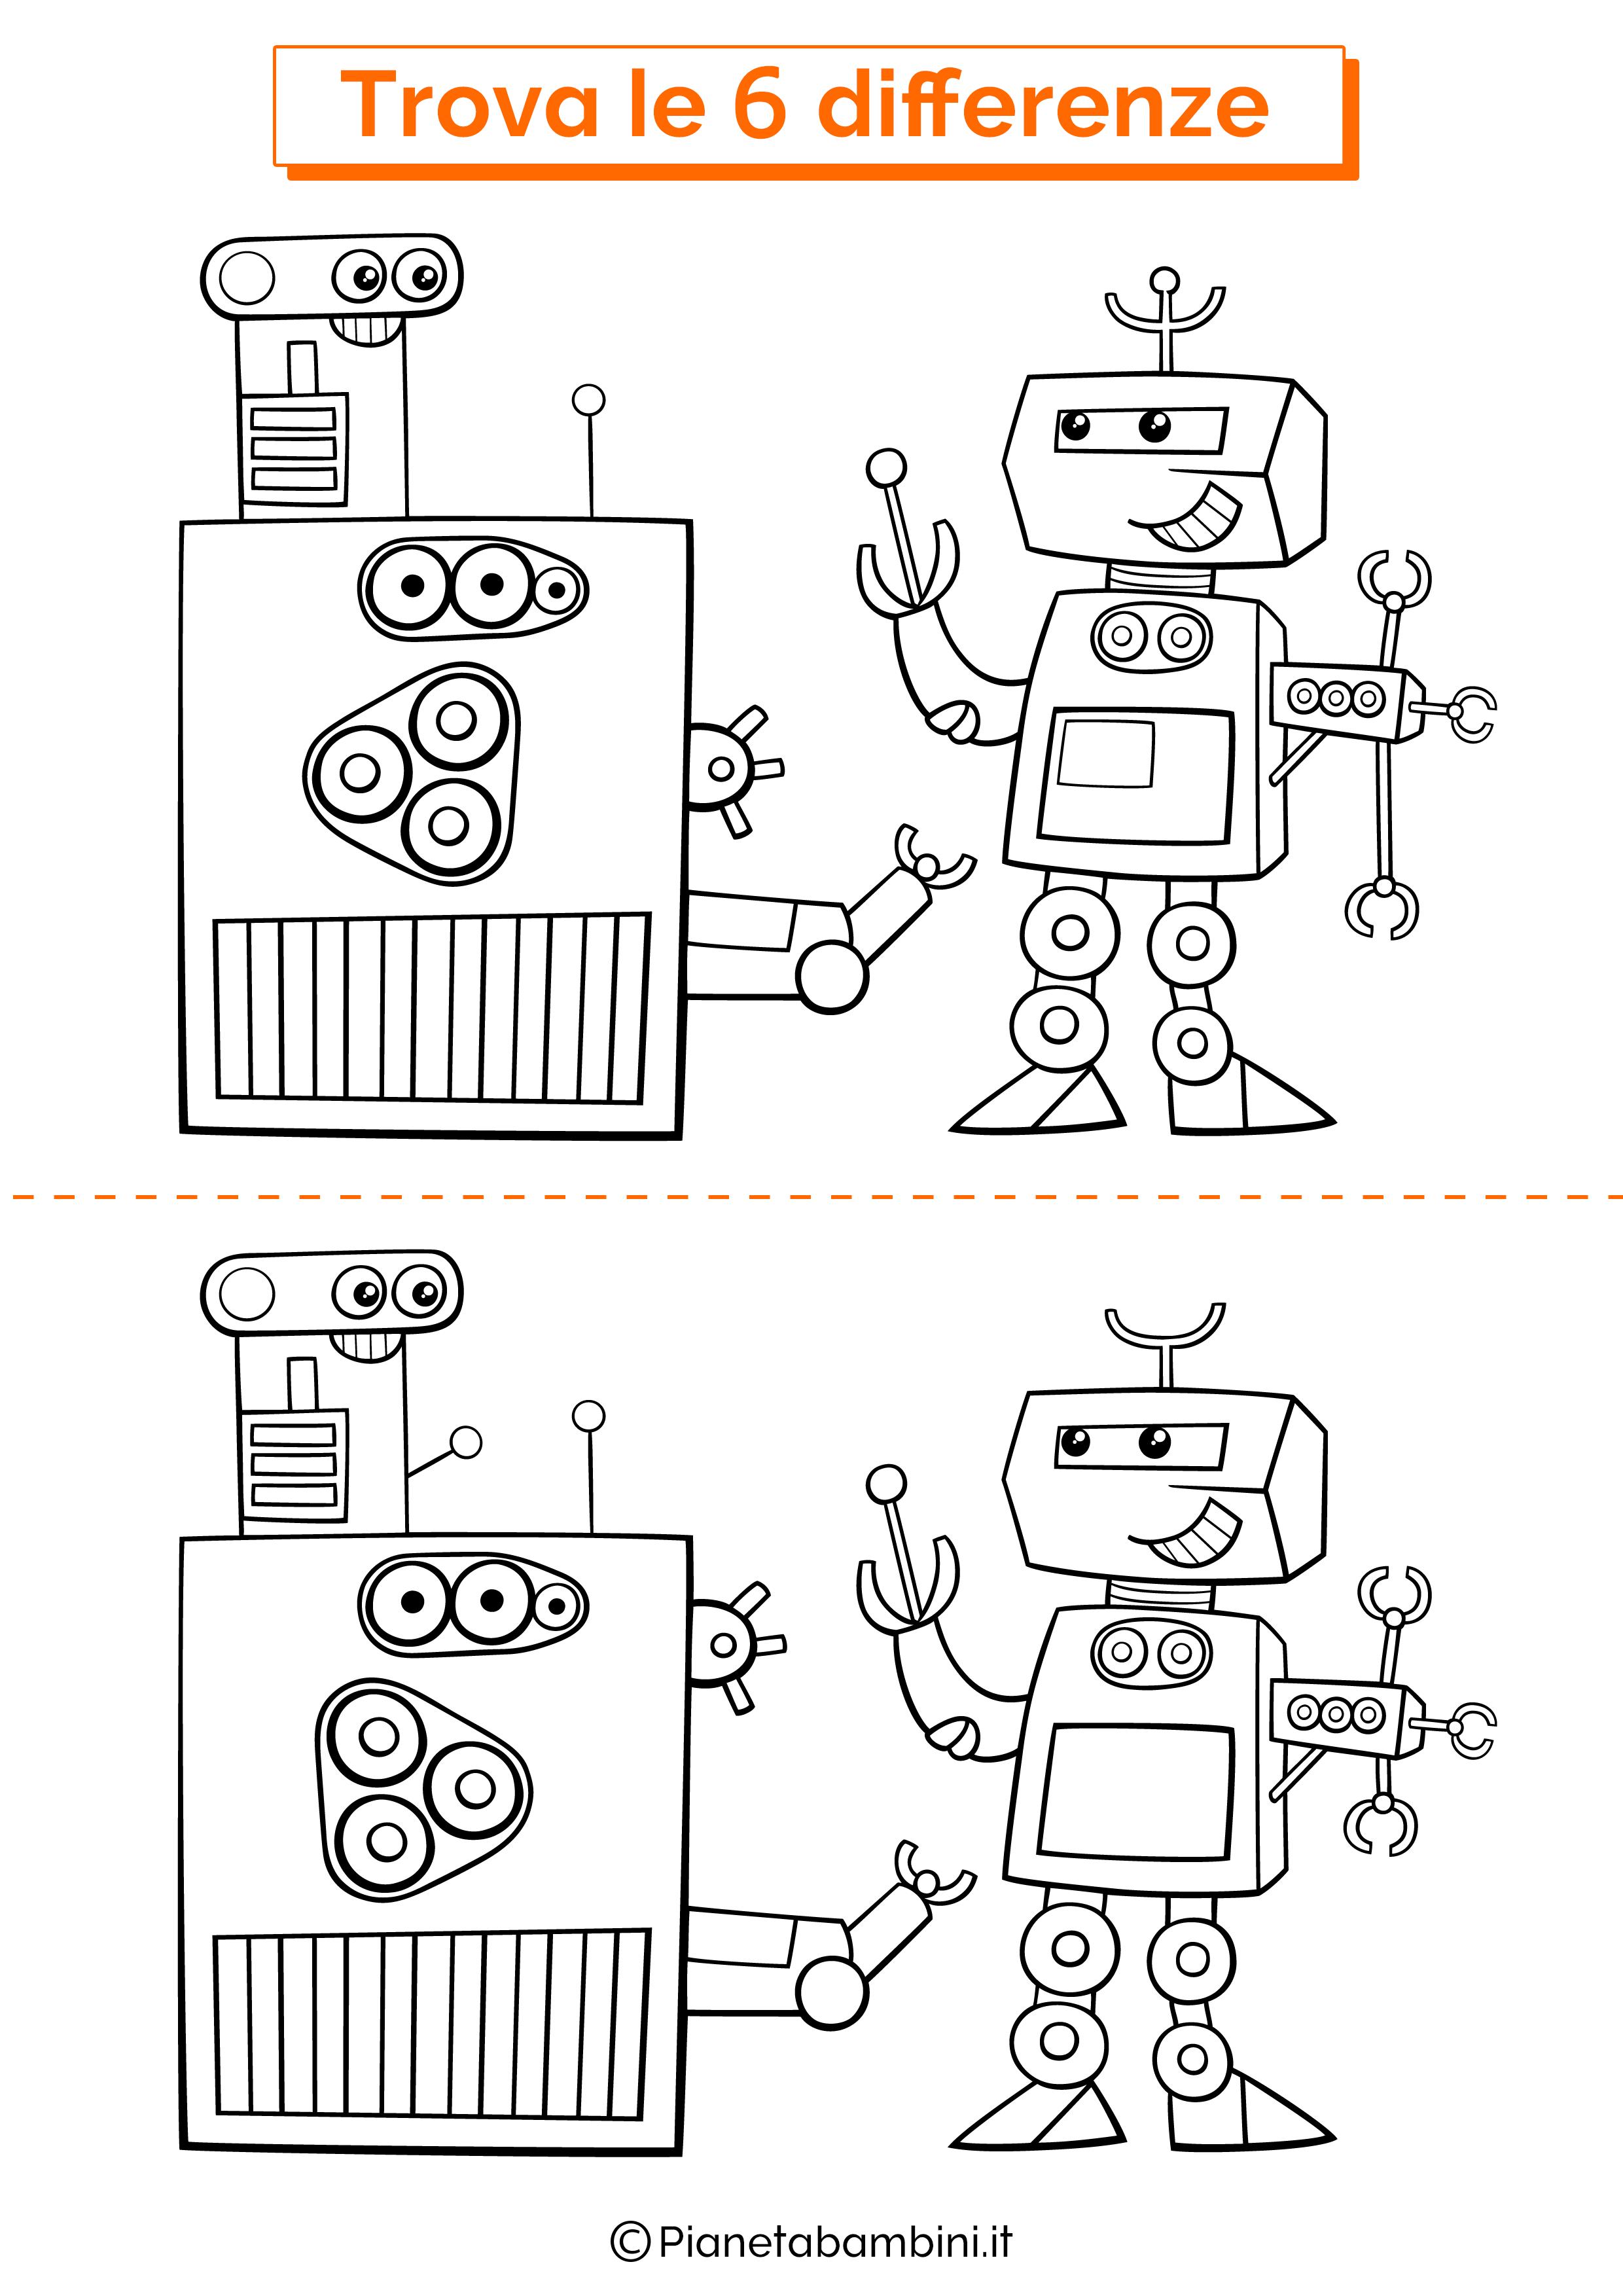 Disegno trova 6 differenze robot macchina